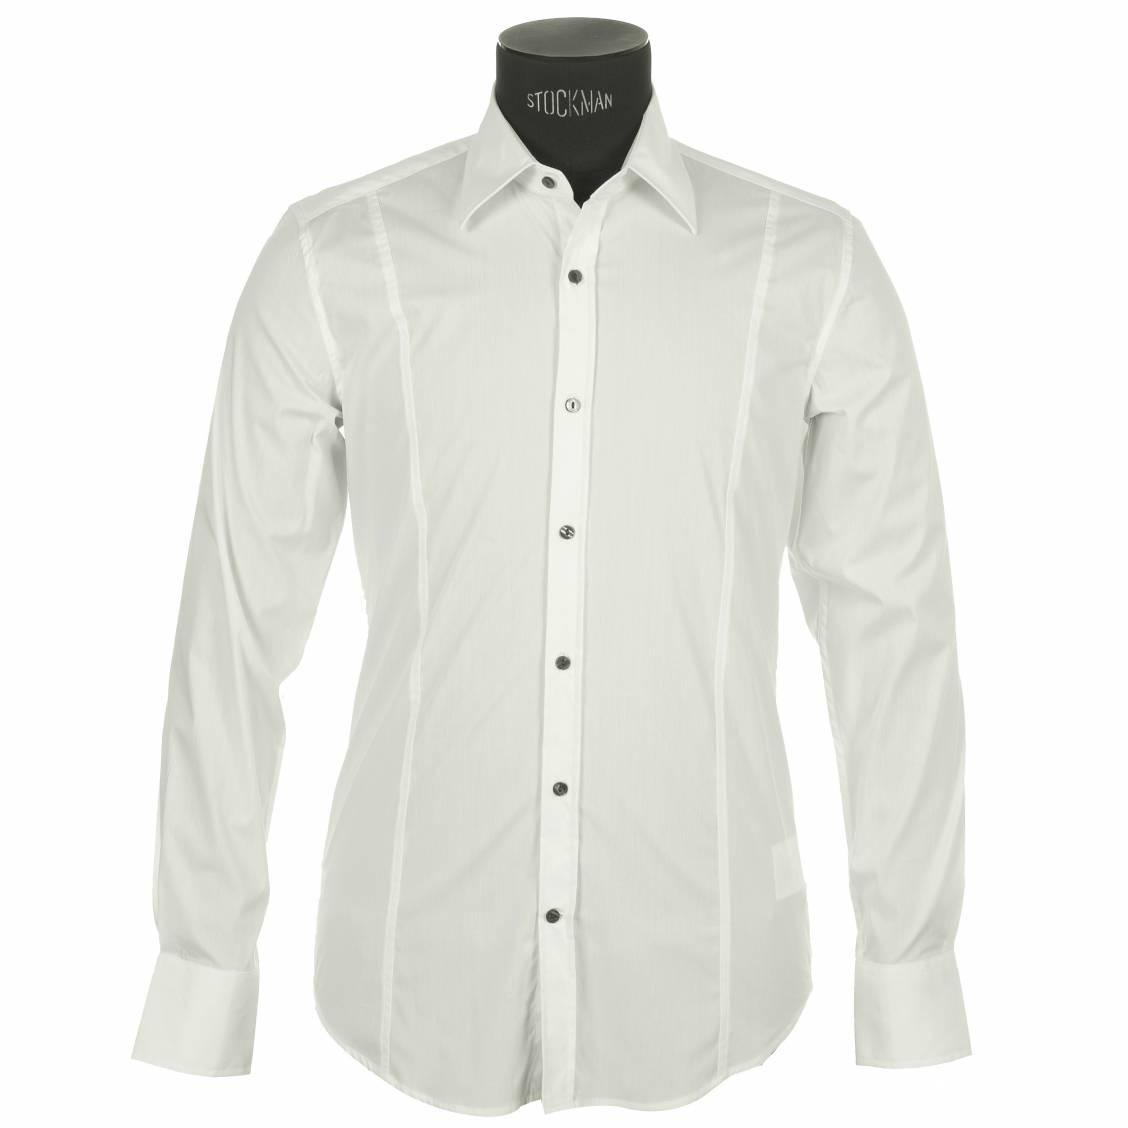 chemise blanche homme cintree. Black Bedroom Furniture Sets. Home Design Ideas